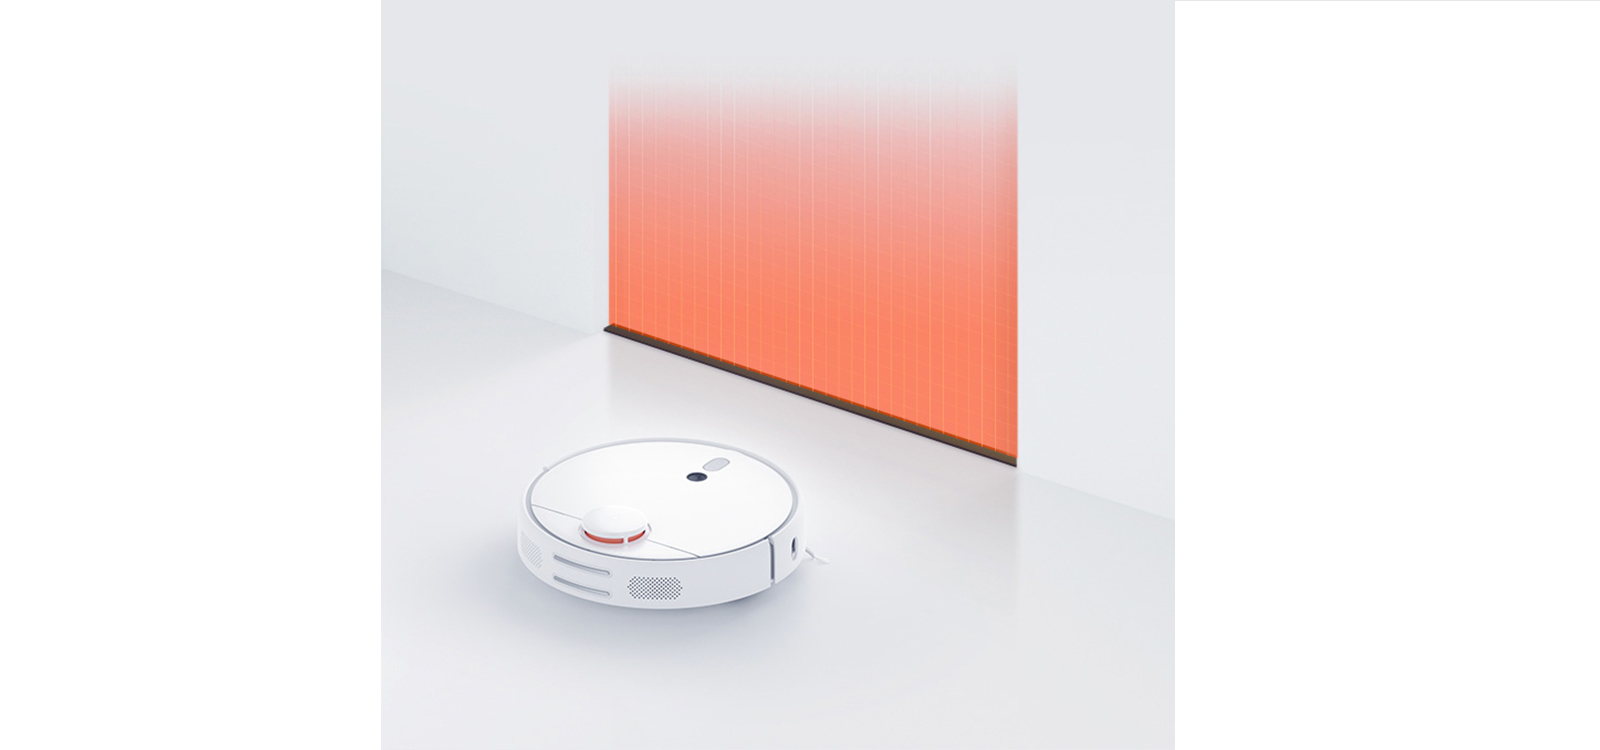 Робот-пылесос Xiaomi Mijia 1S robot4home.ru